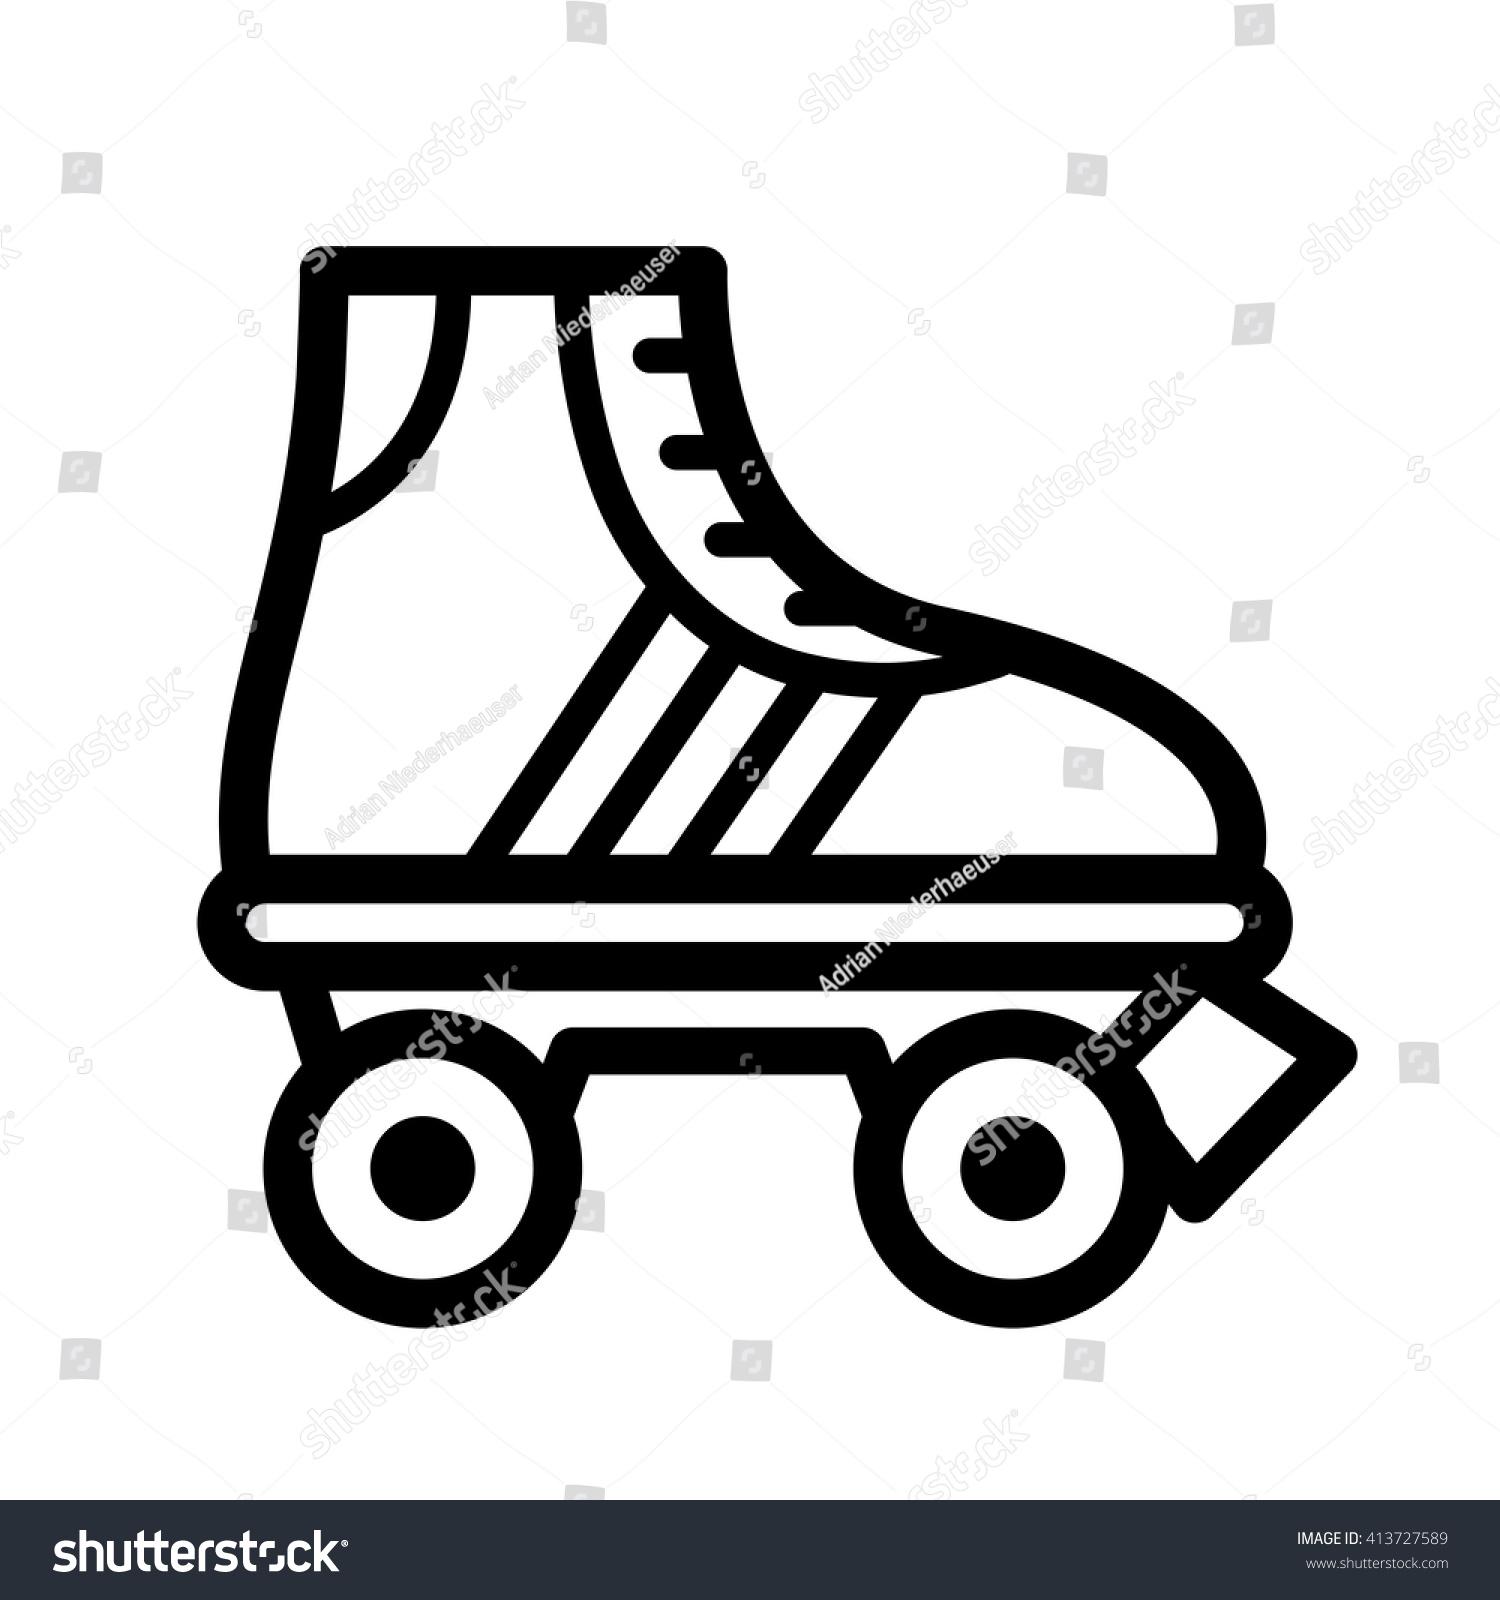 Roller skates book - Black Outline Single Roller Skate Cartoon Illustration Seventies Vector Icon Isolated On White